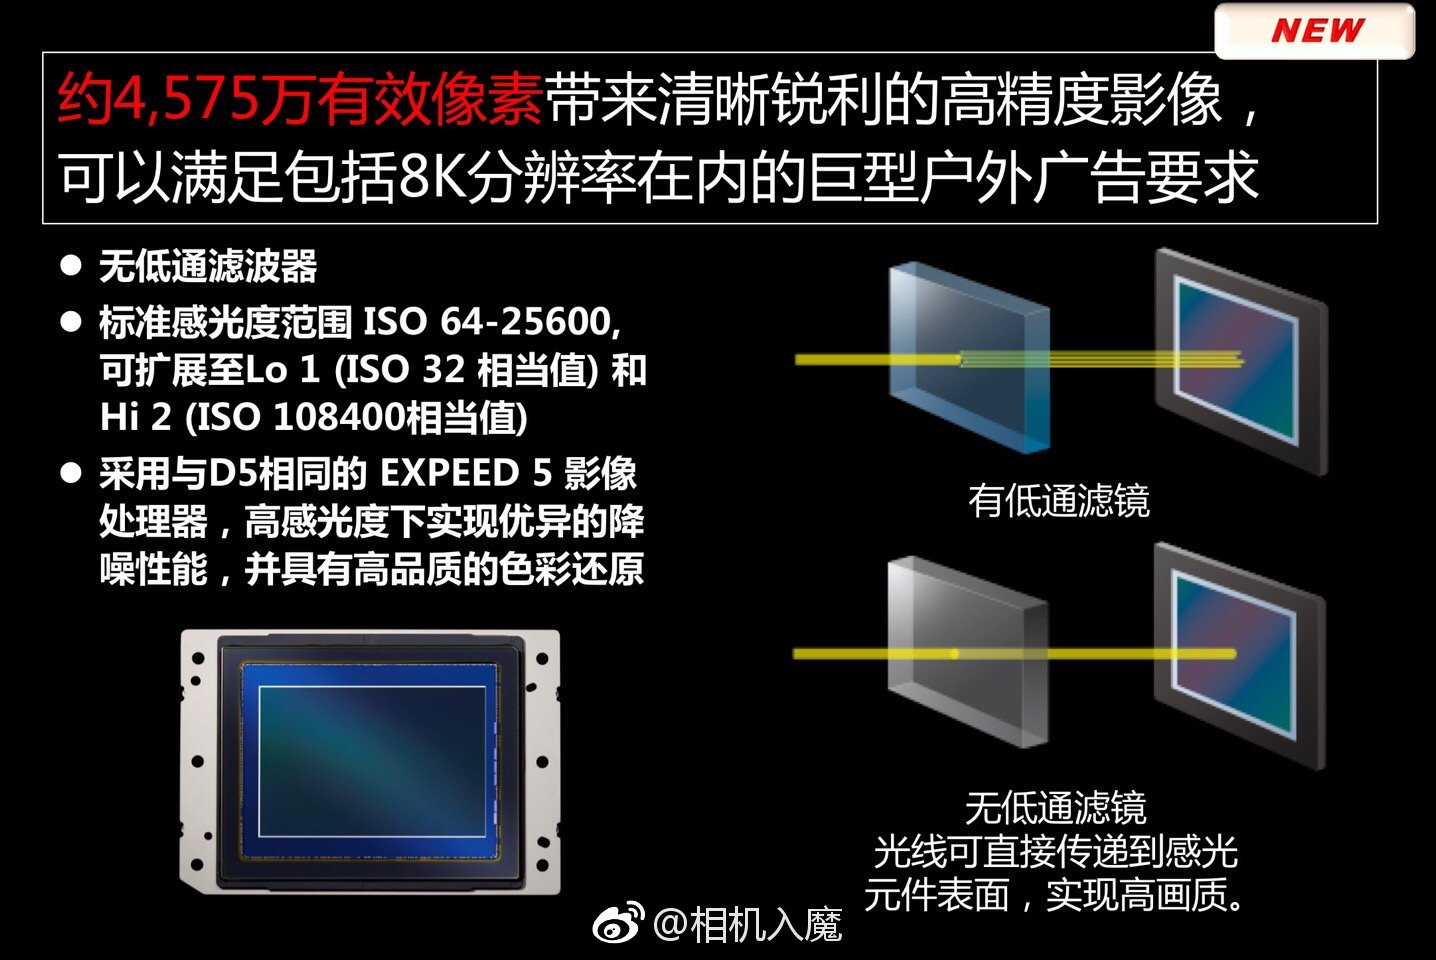 Nikon-D850-camera-presentation-leaked-10